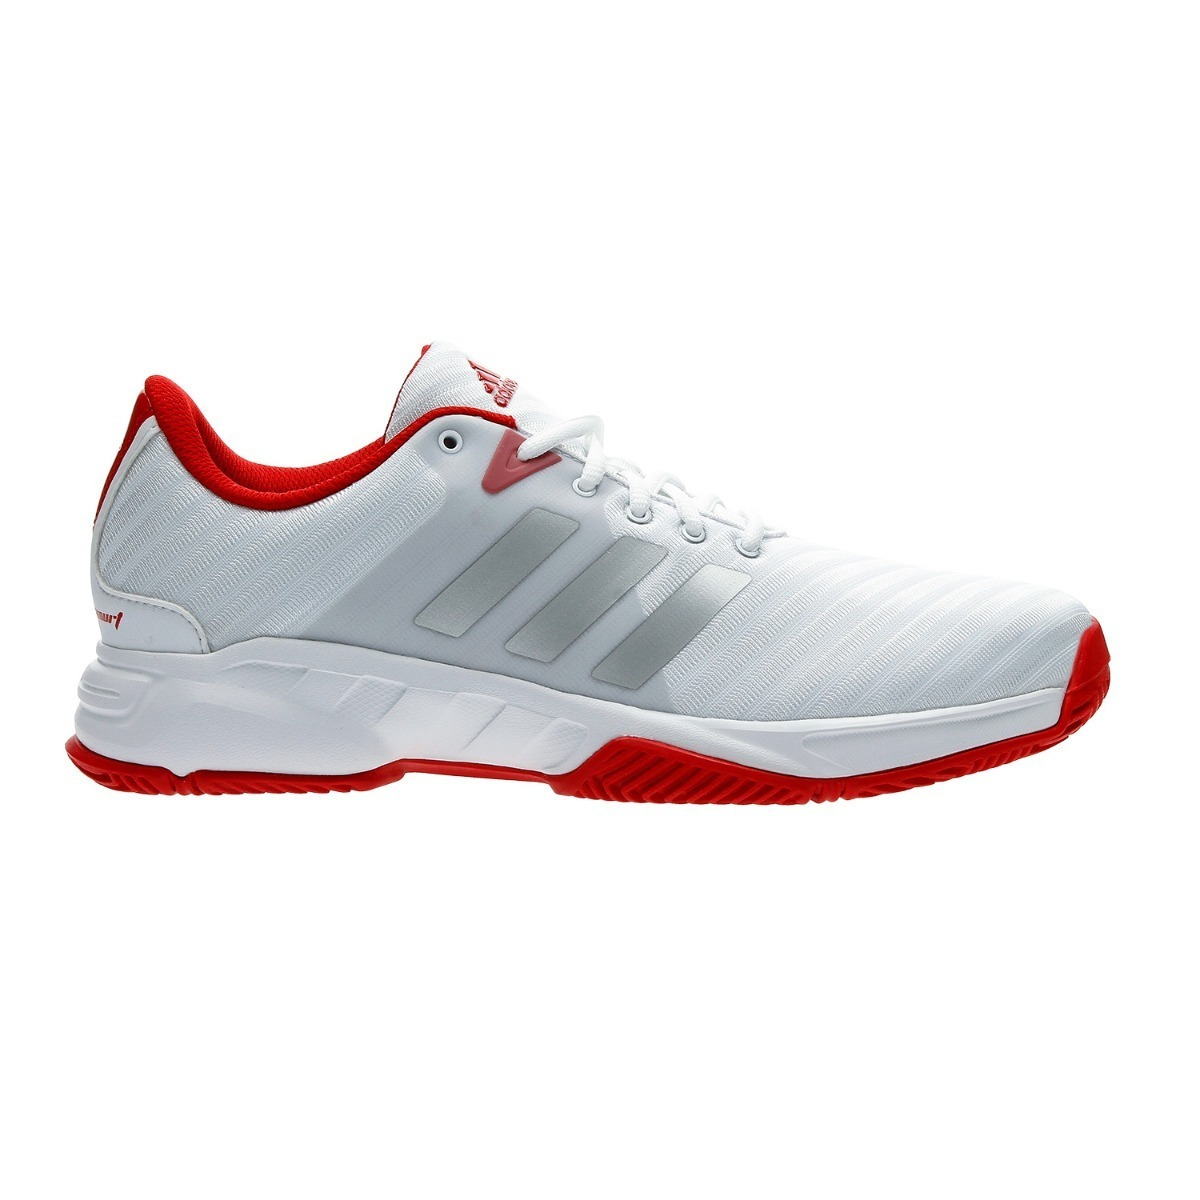 outlet store ac913 95b5b zapatillas adidas barricade court 3 tenis hombre. Cargando zoom.